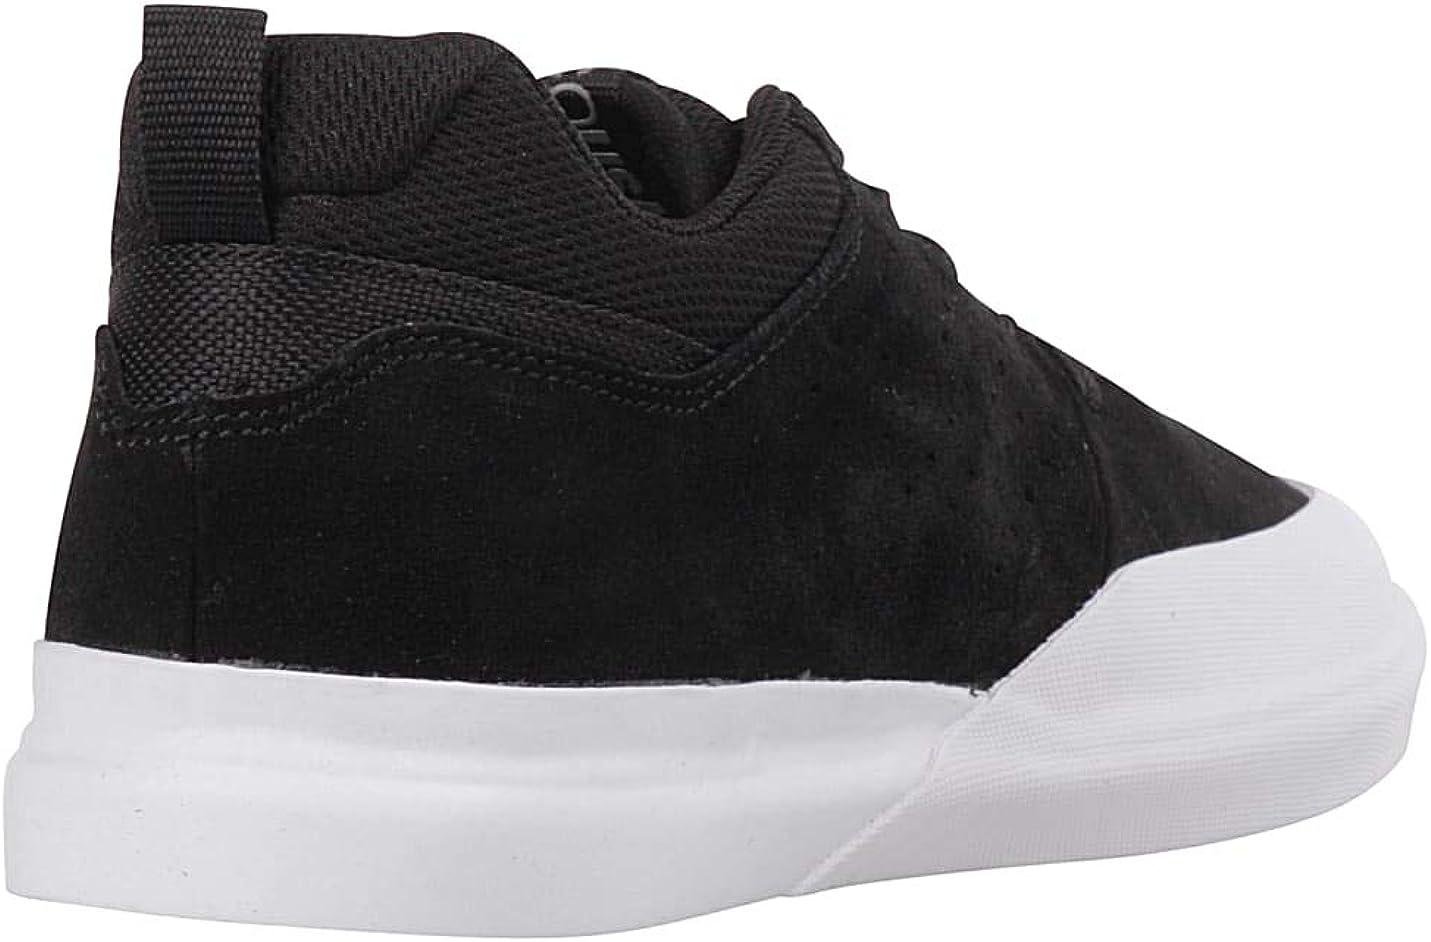 Black Skate Shoes Men EU 46 DC Shoes Infinite S Skate Shoes for Men